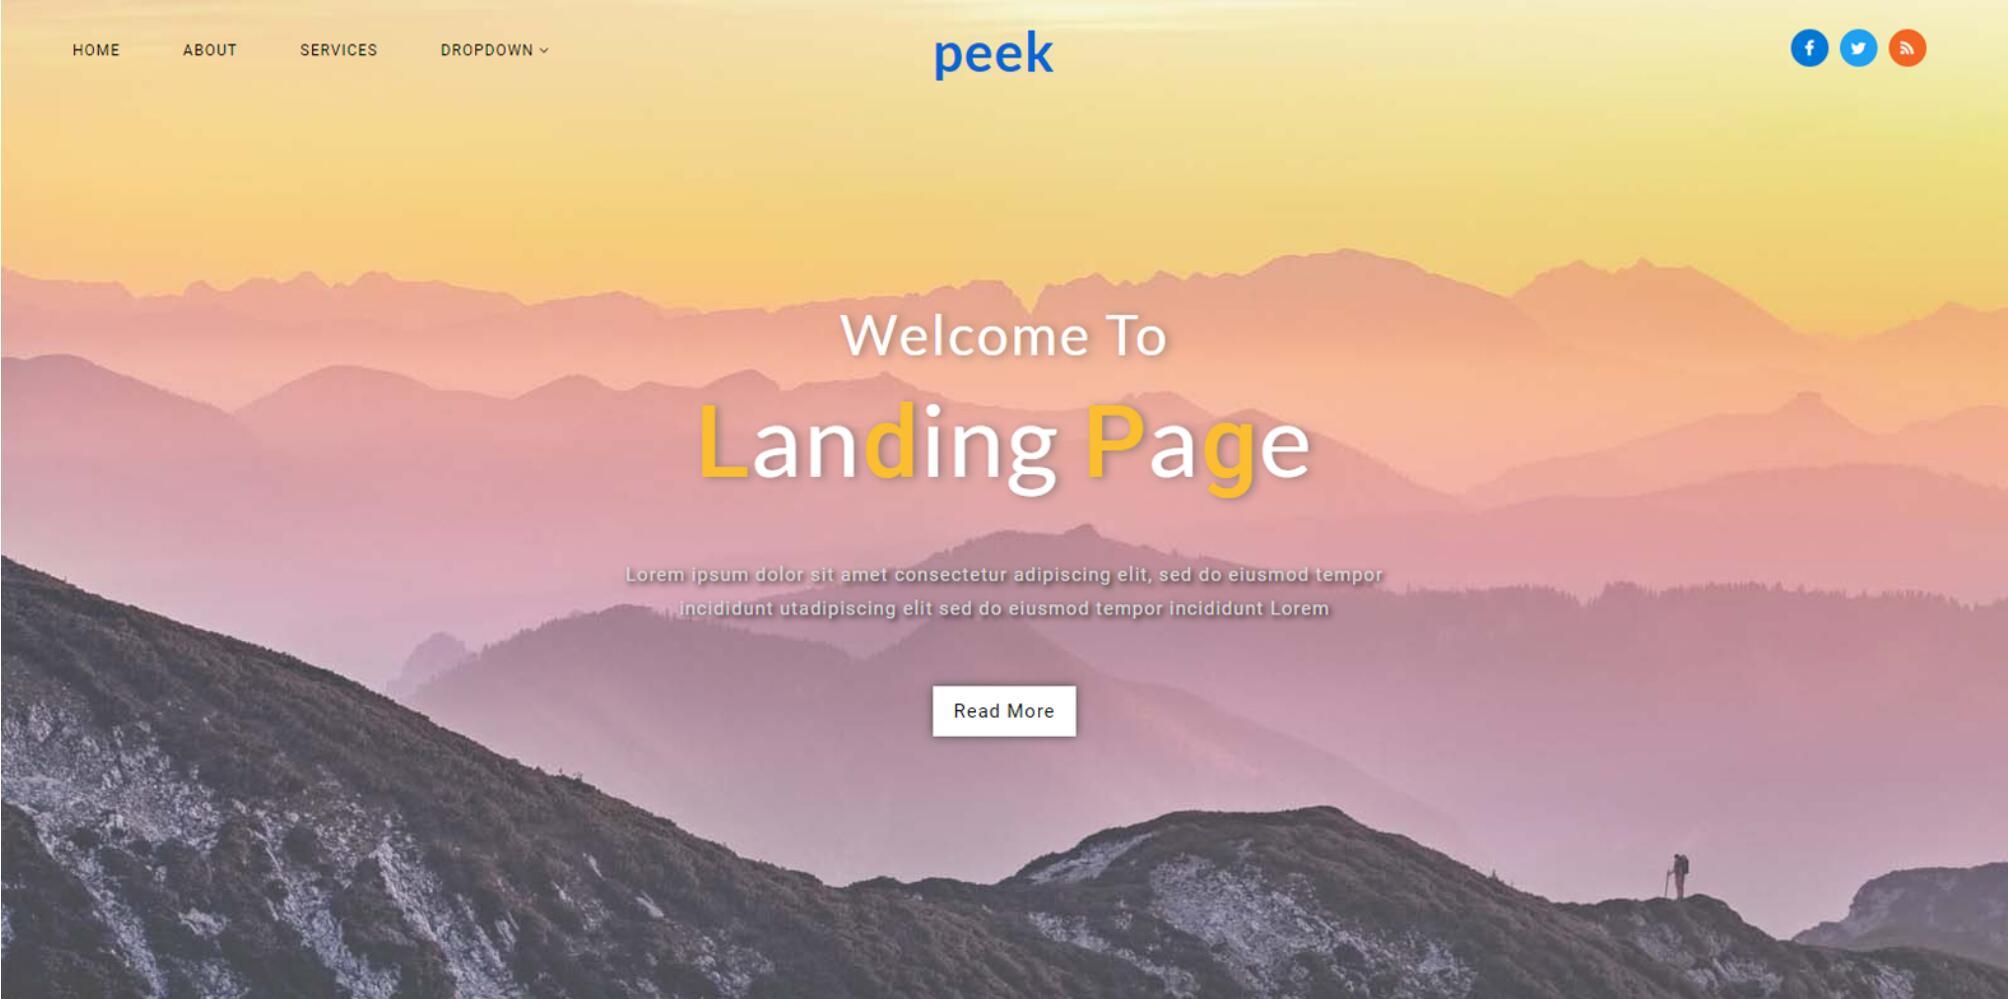 Peek - Responsive Web Mockup for Landing Page